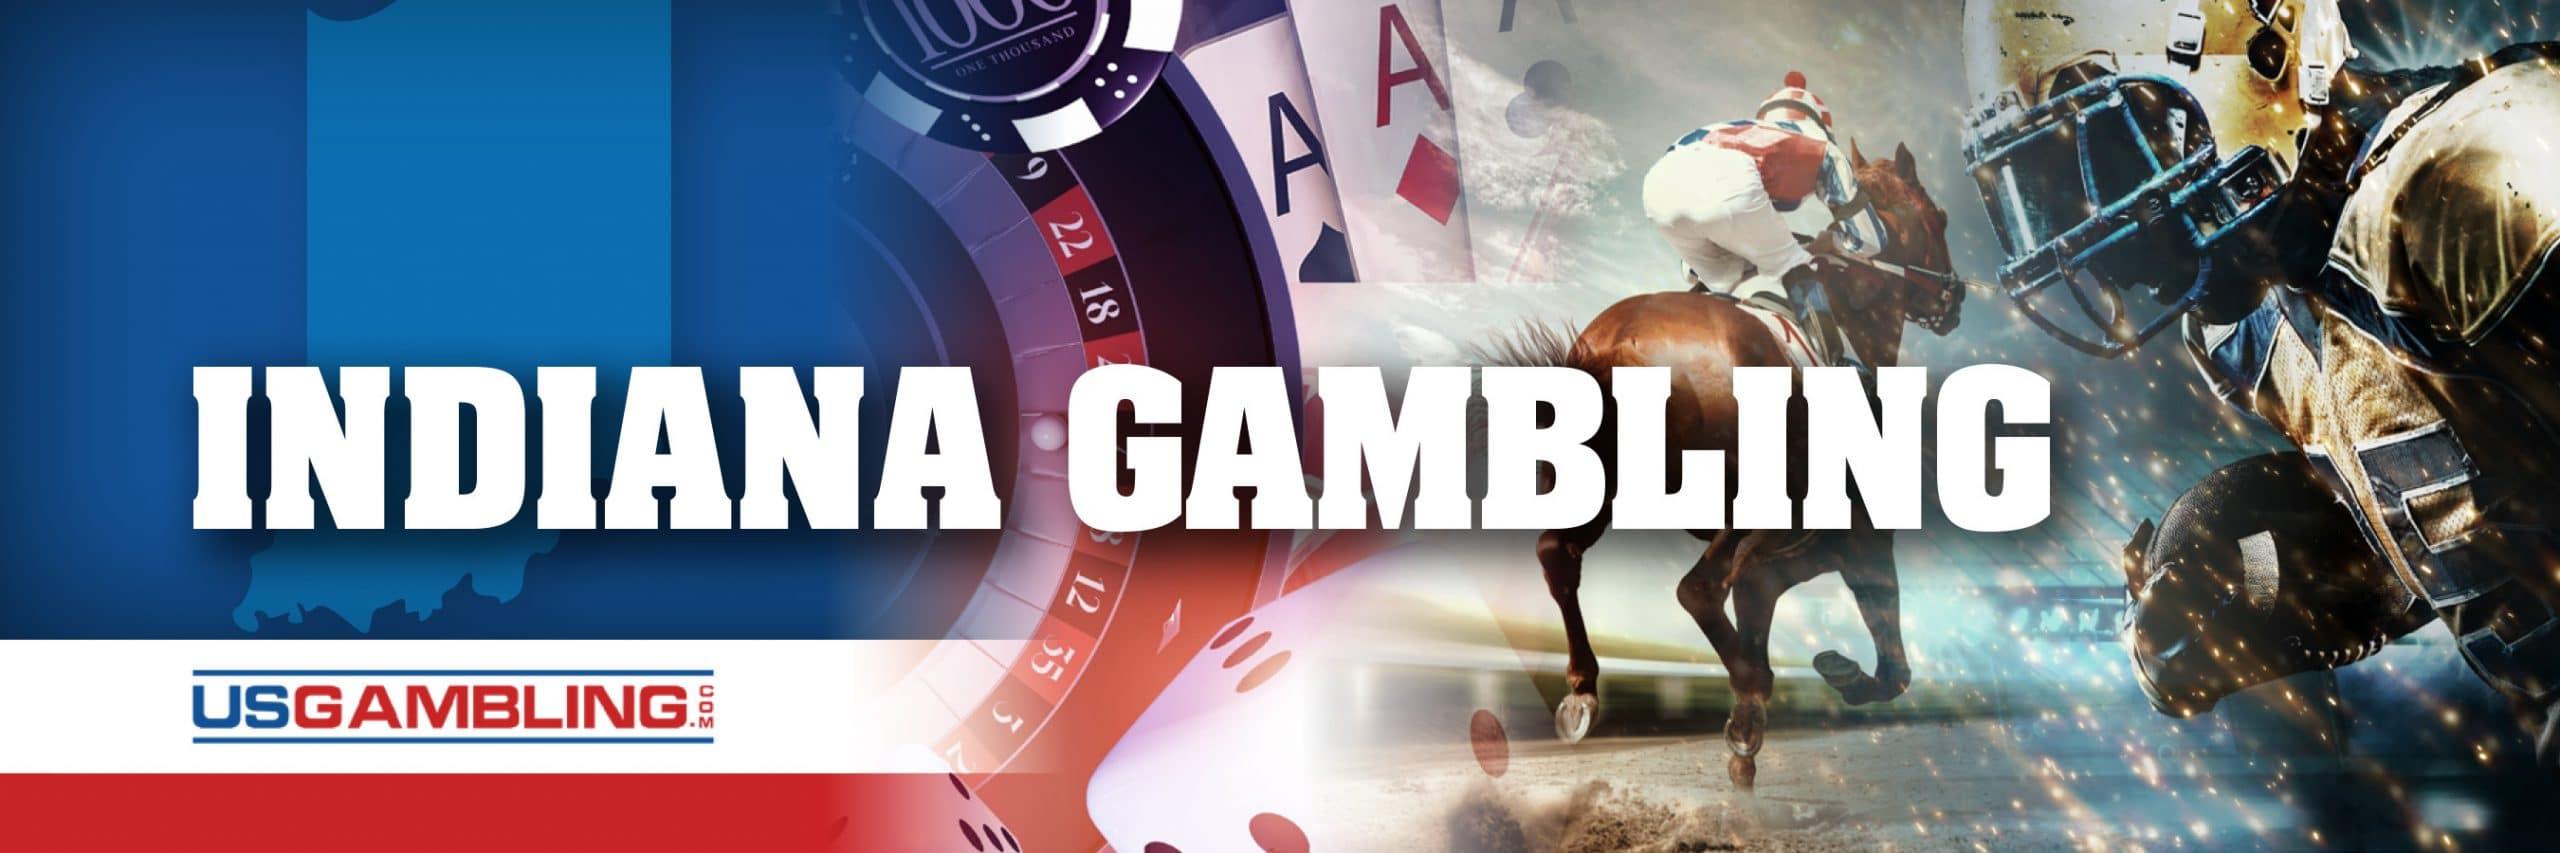 Legal Indiana Gambling